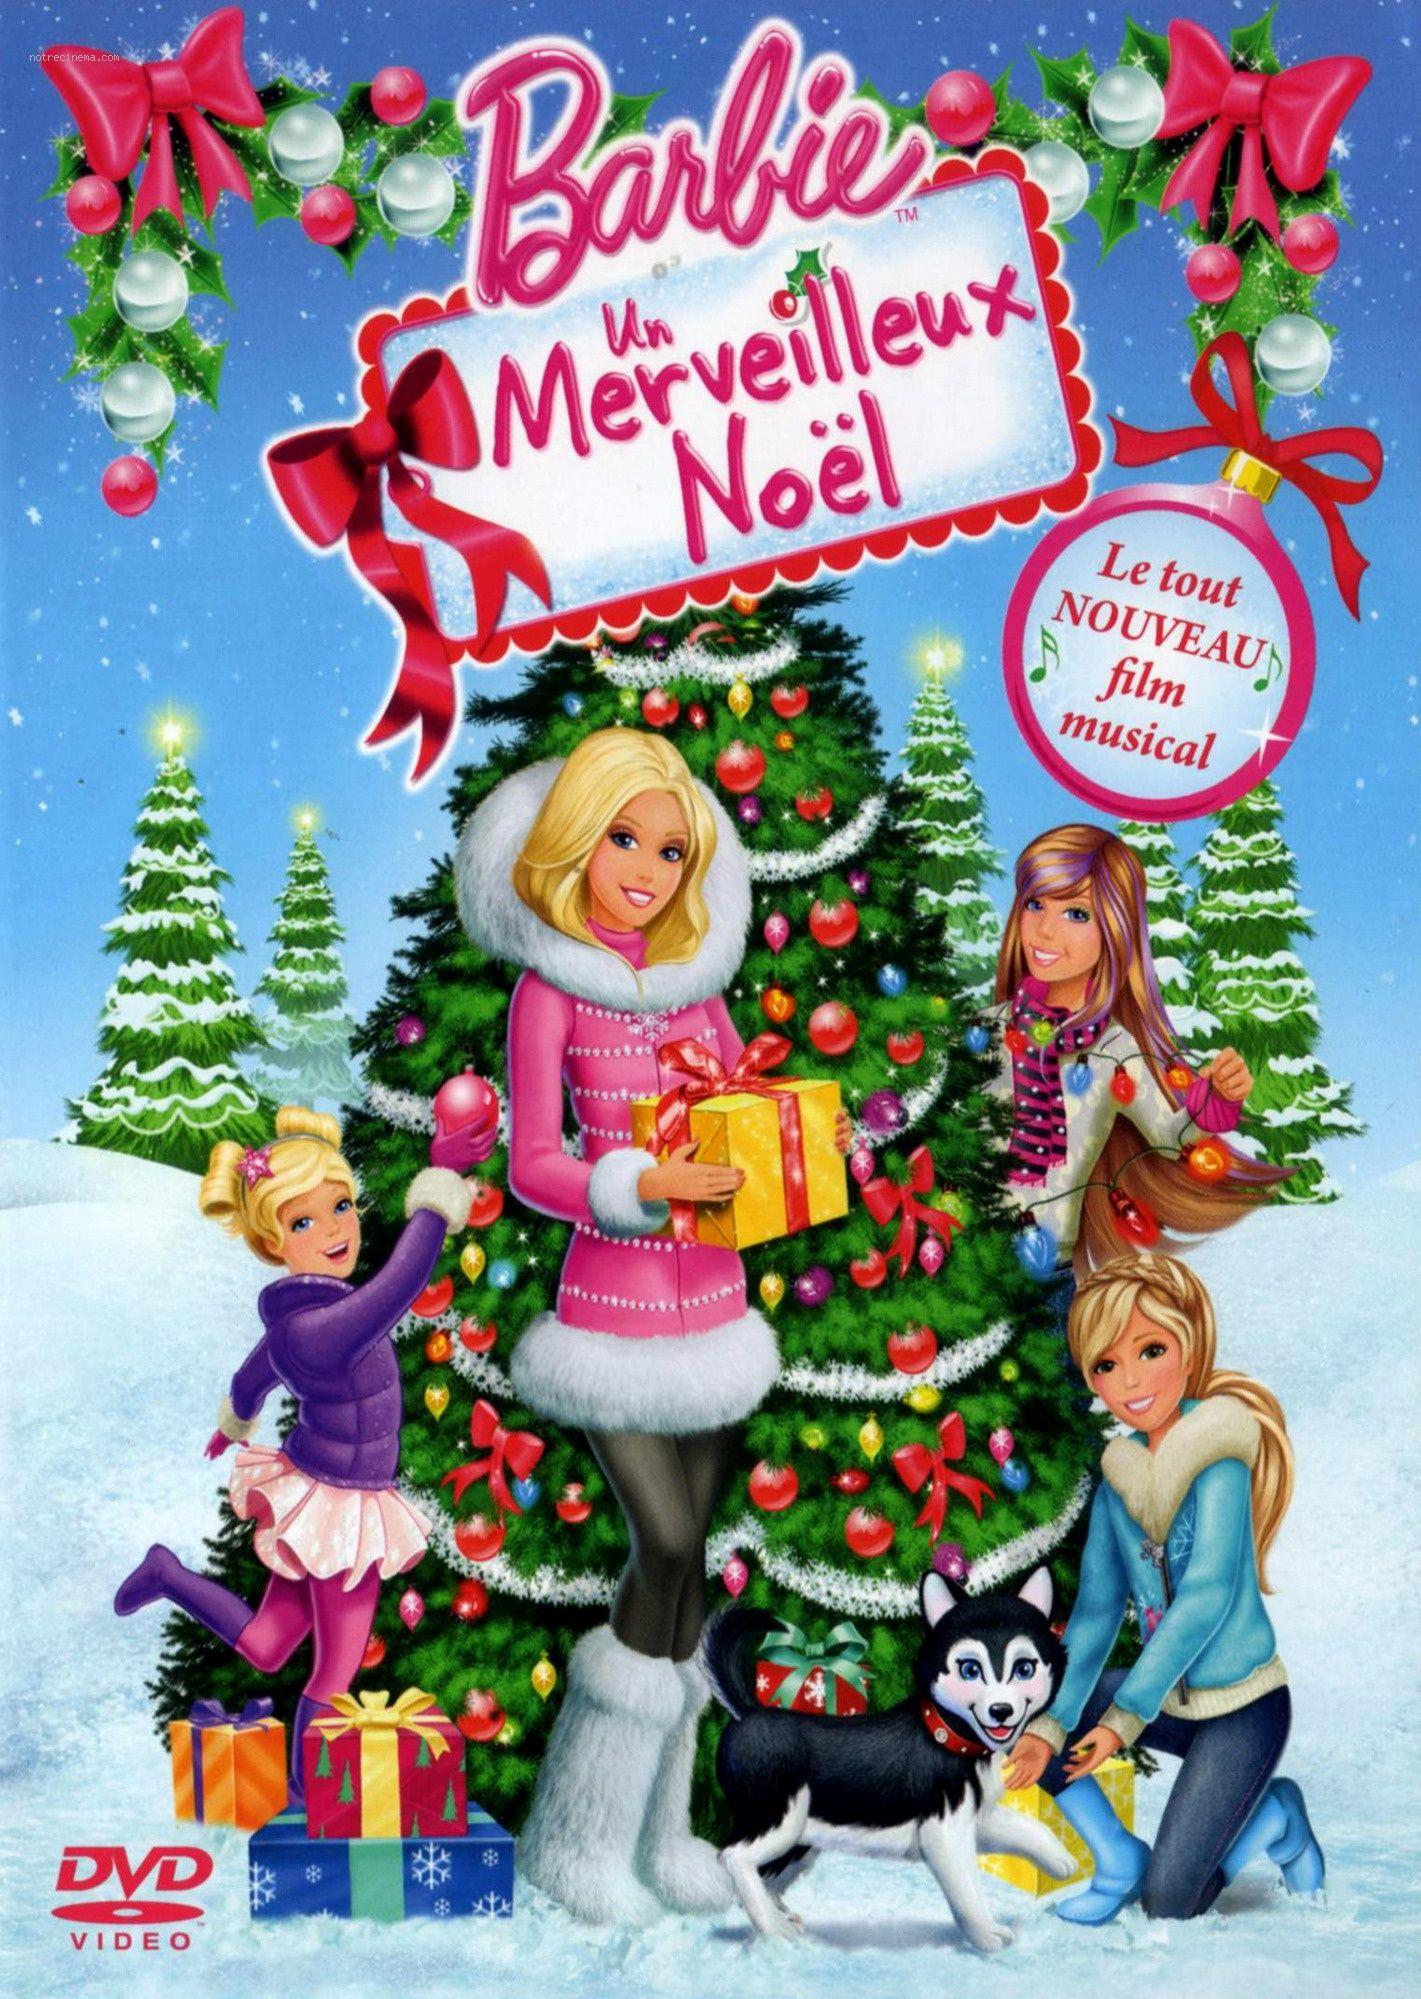 Barbie, Un Merveilleux Noël | barbie in 2018 | Pinterest | Movies ...